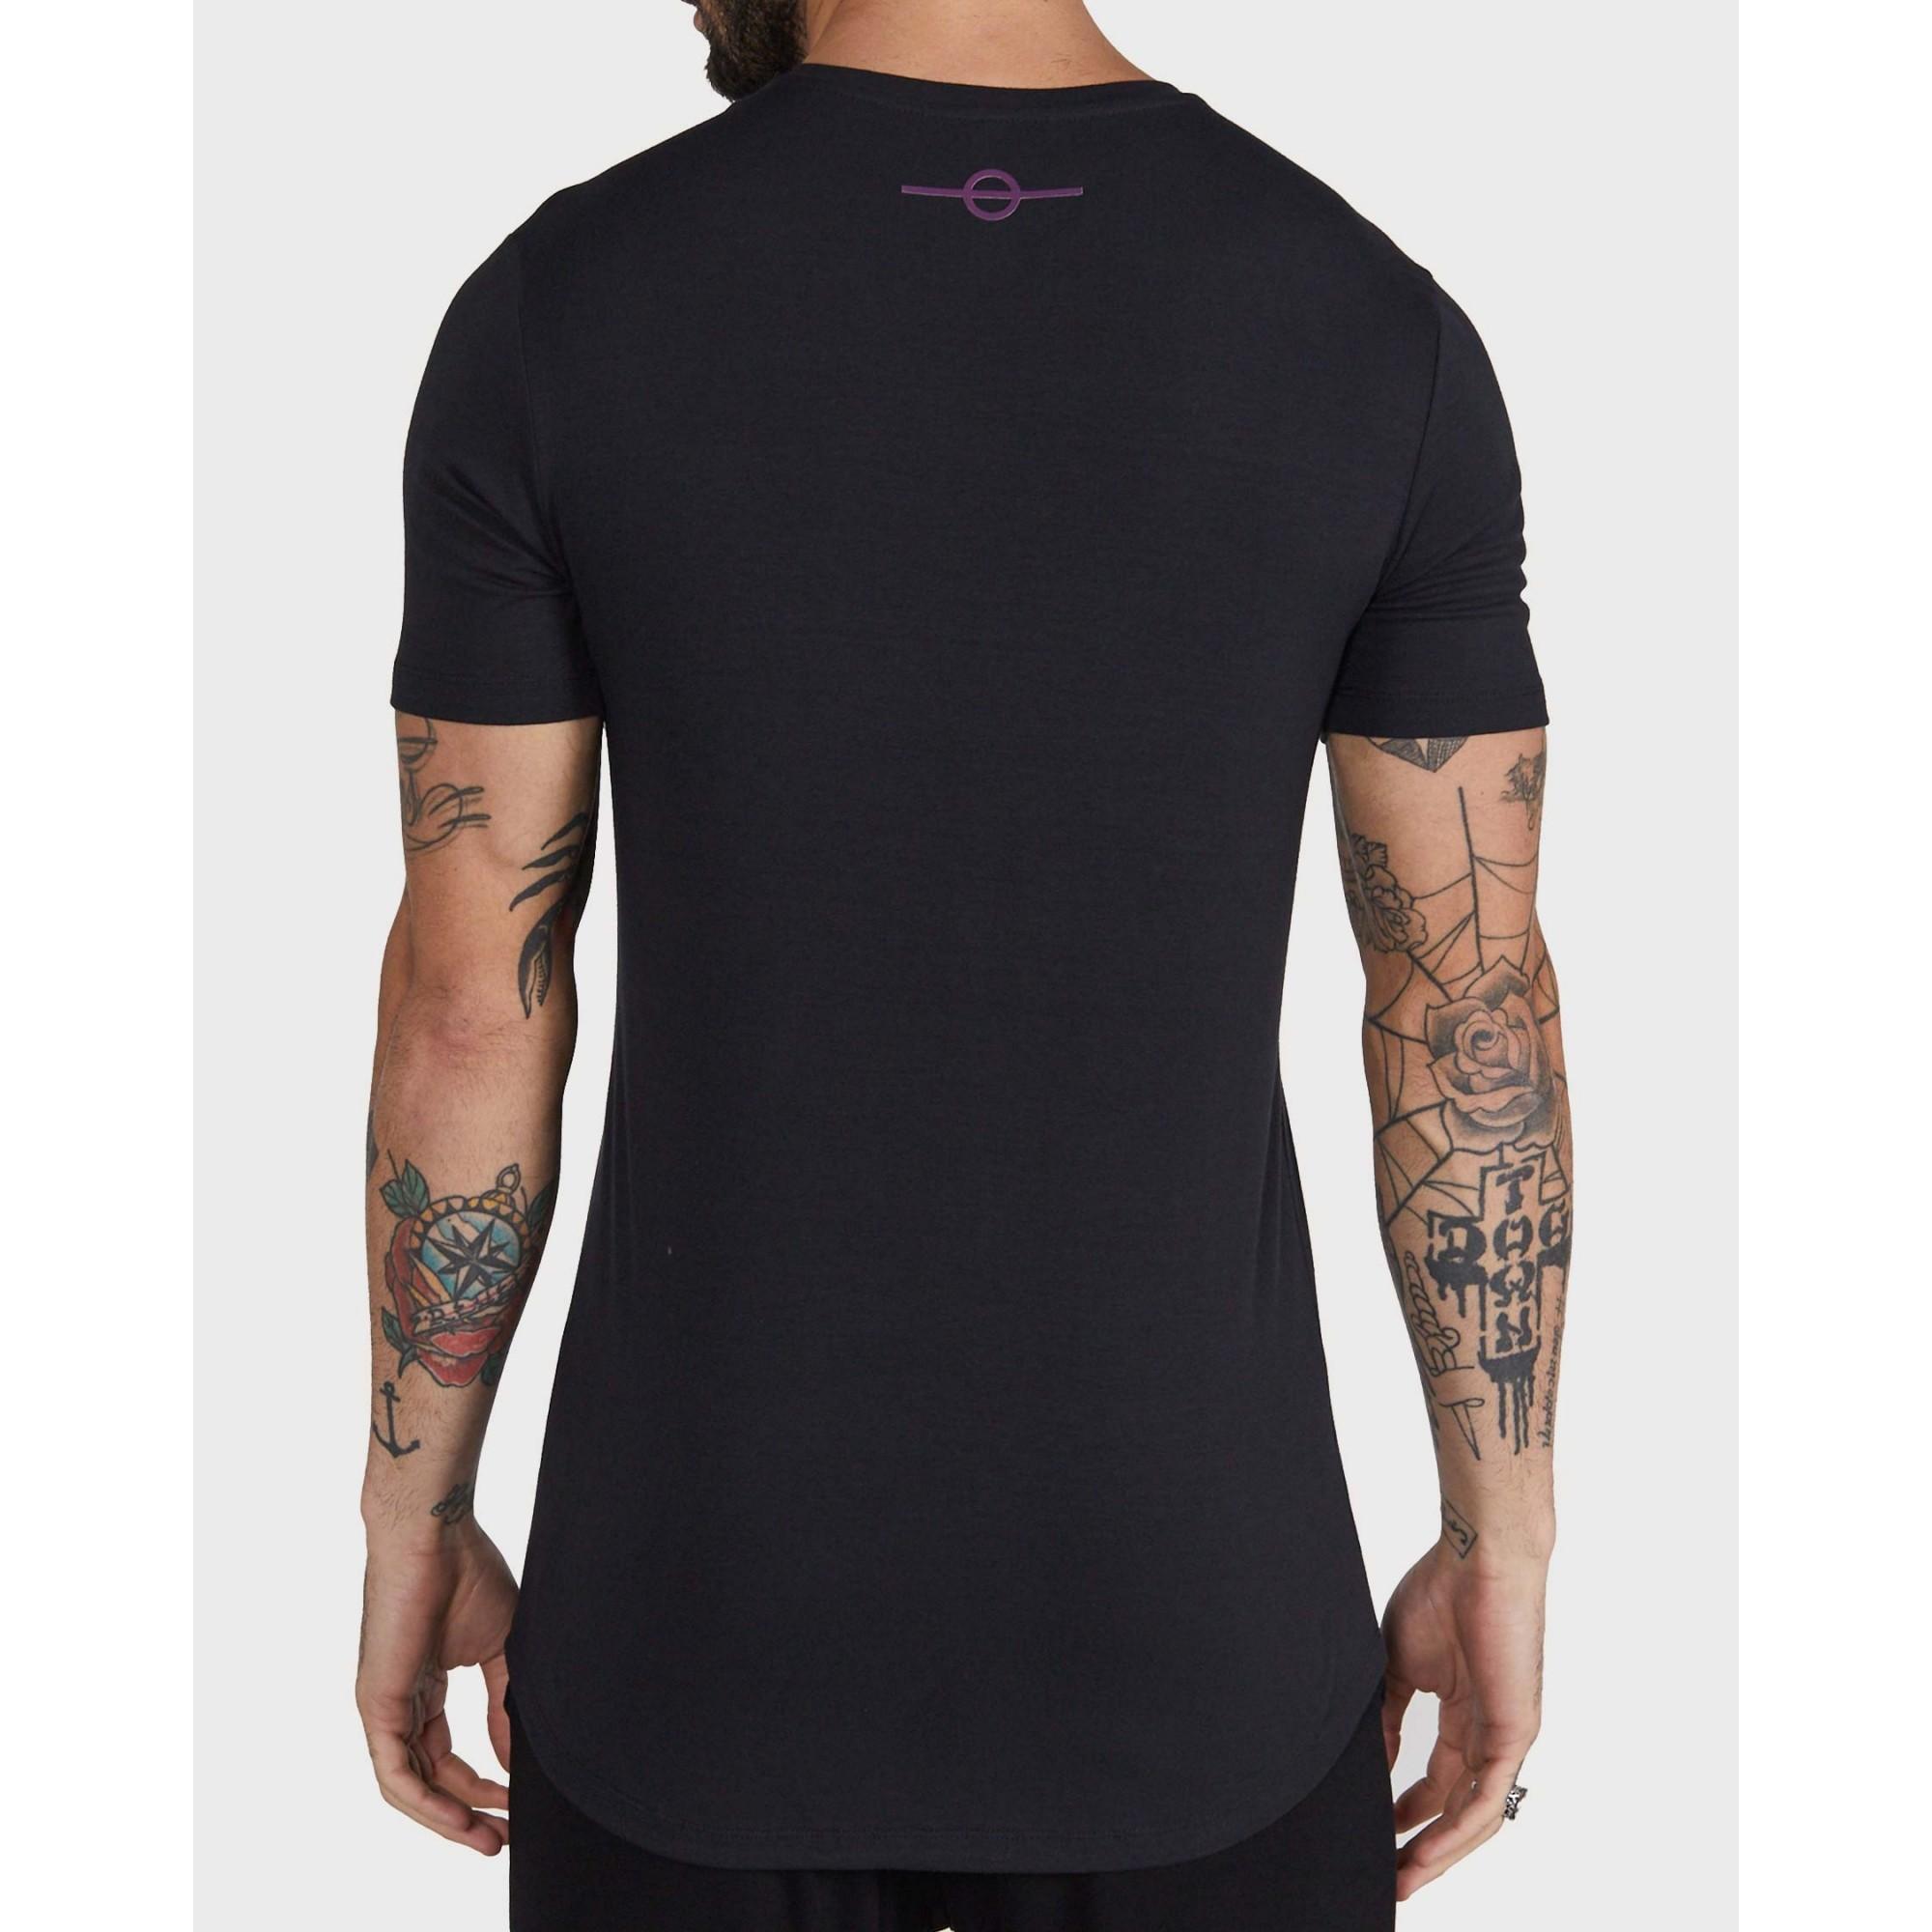 Camiseta Buh Pinceladas Black